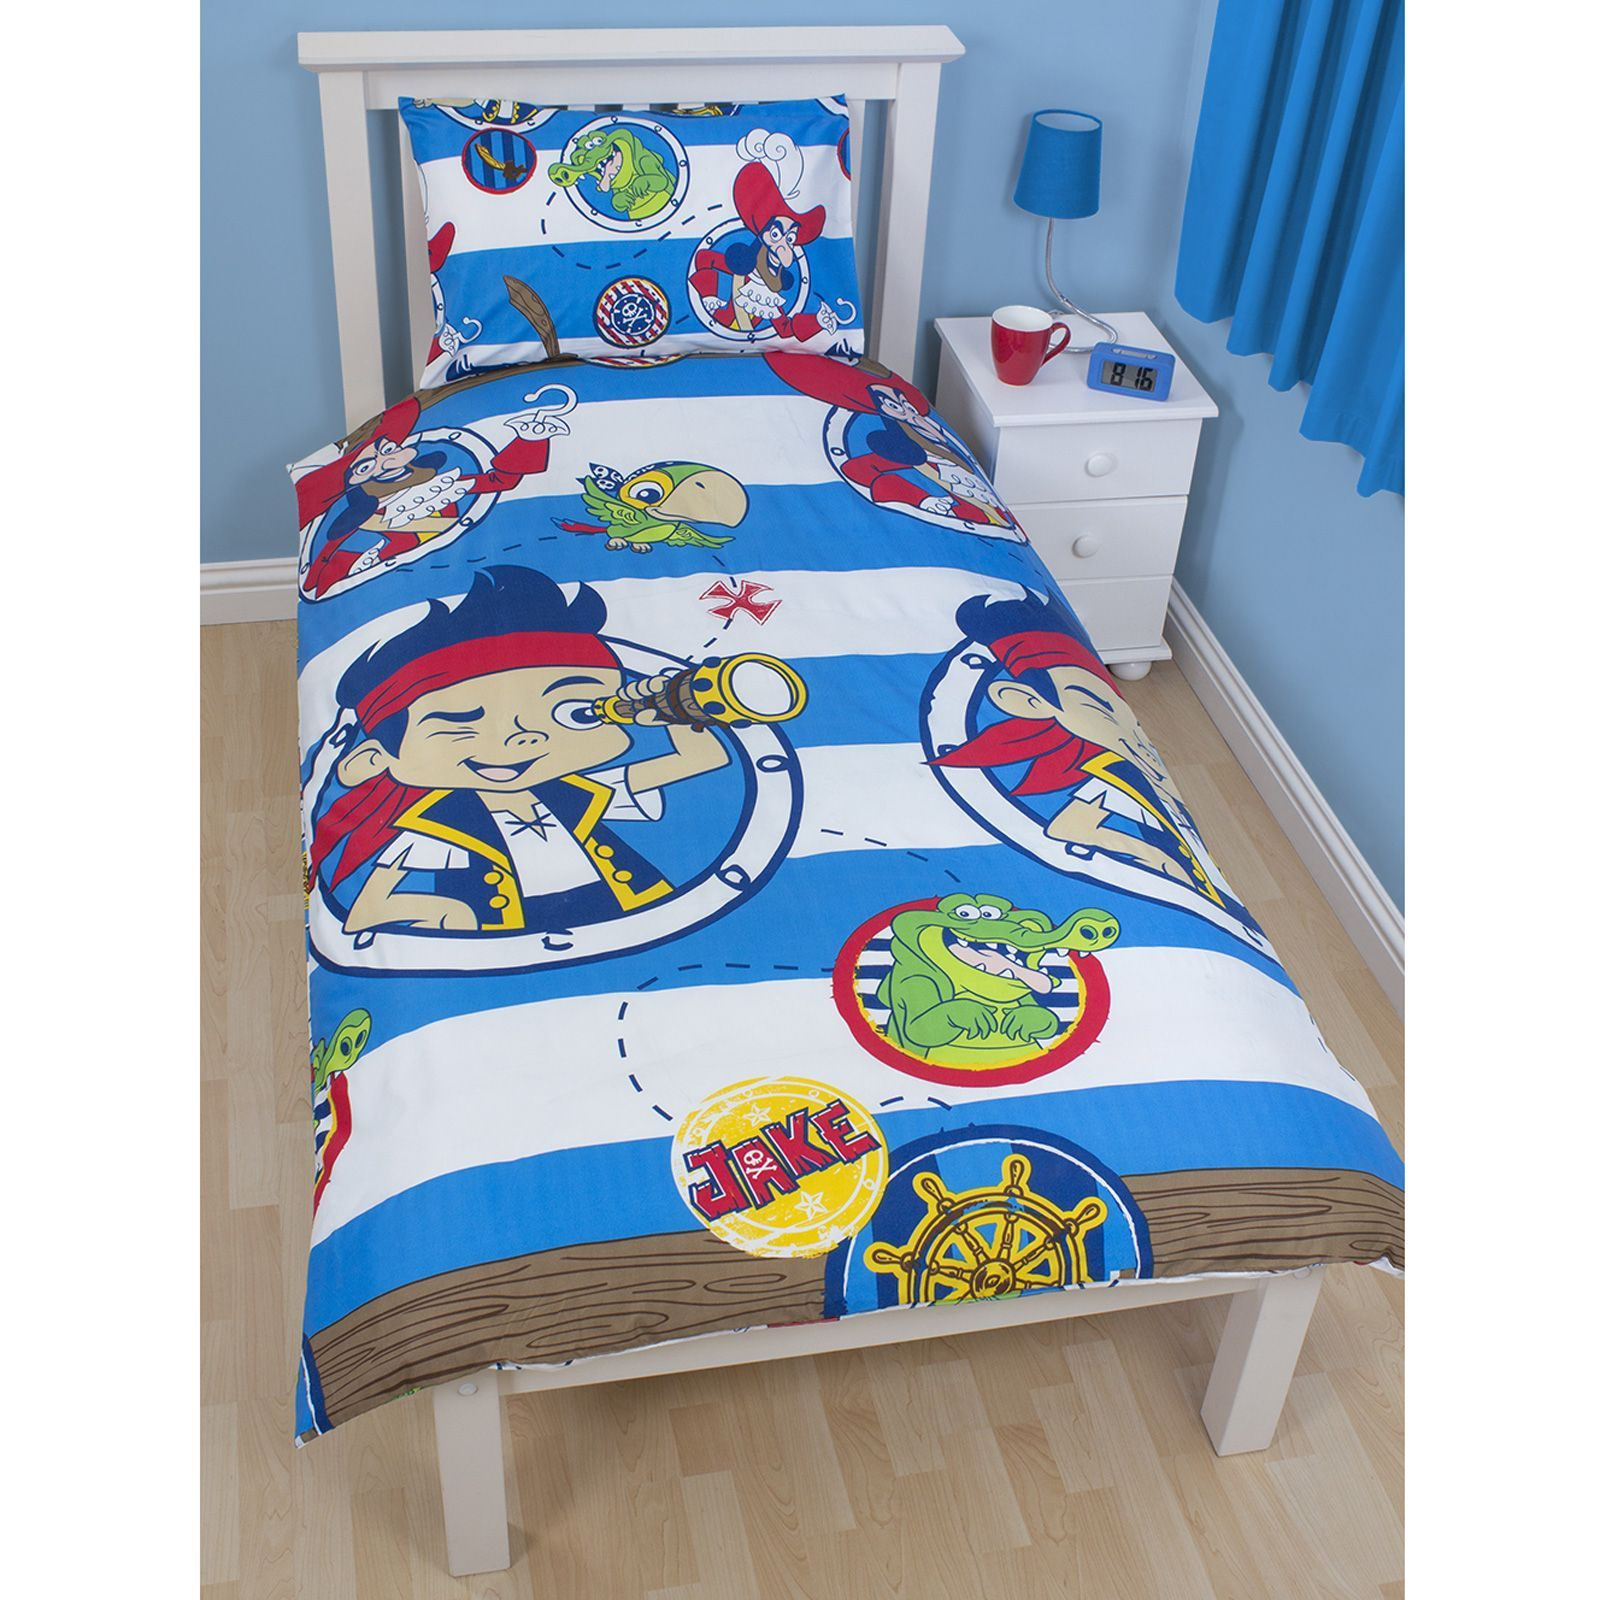 official kids disney character single duvet covers. Black Bedroom Furniture Sets. Home Design Ideas